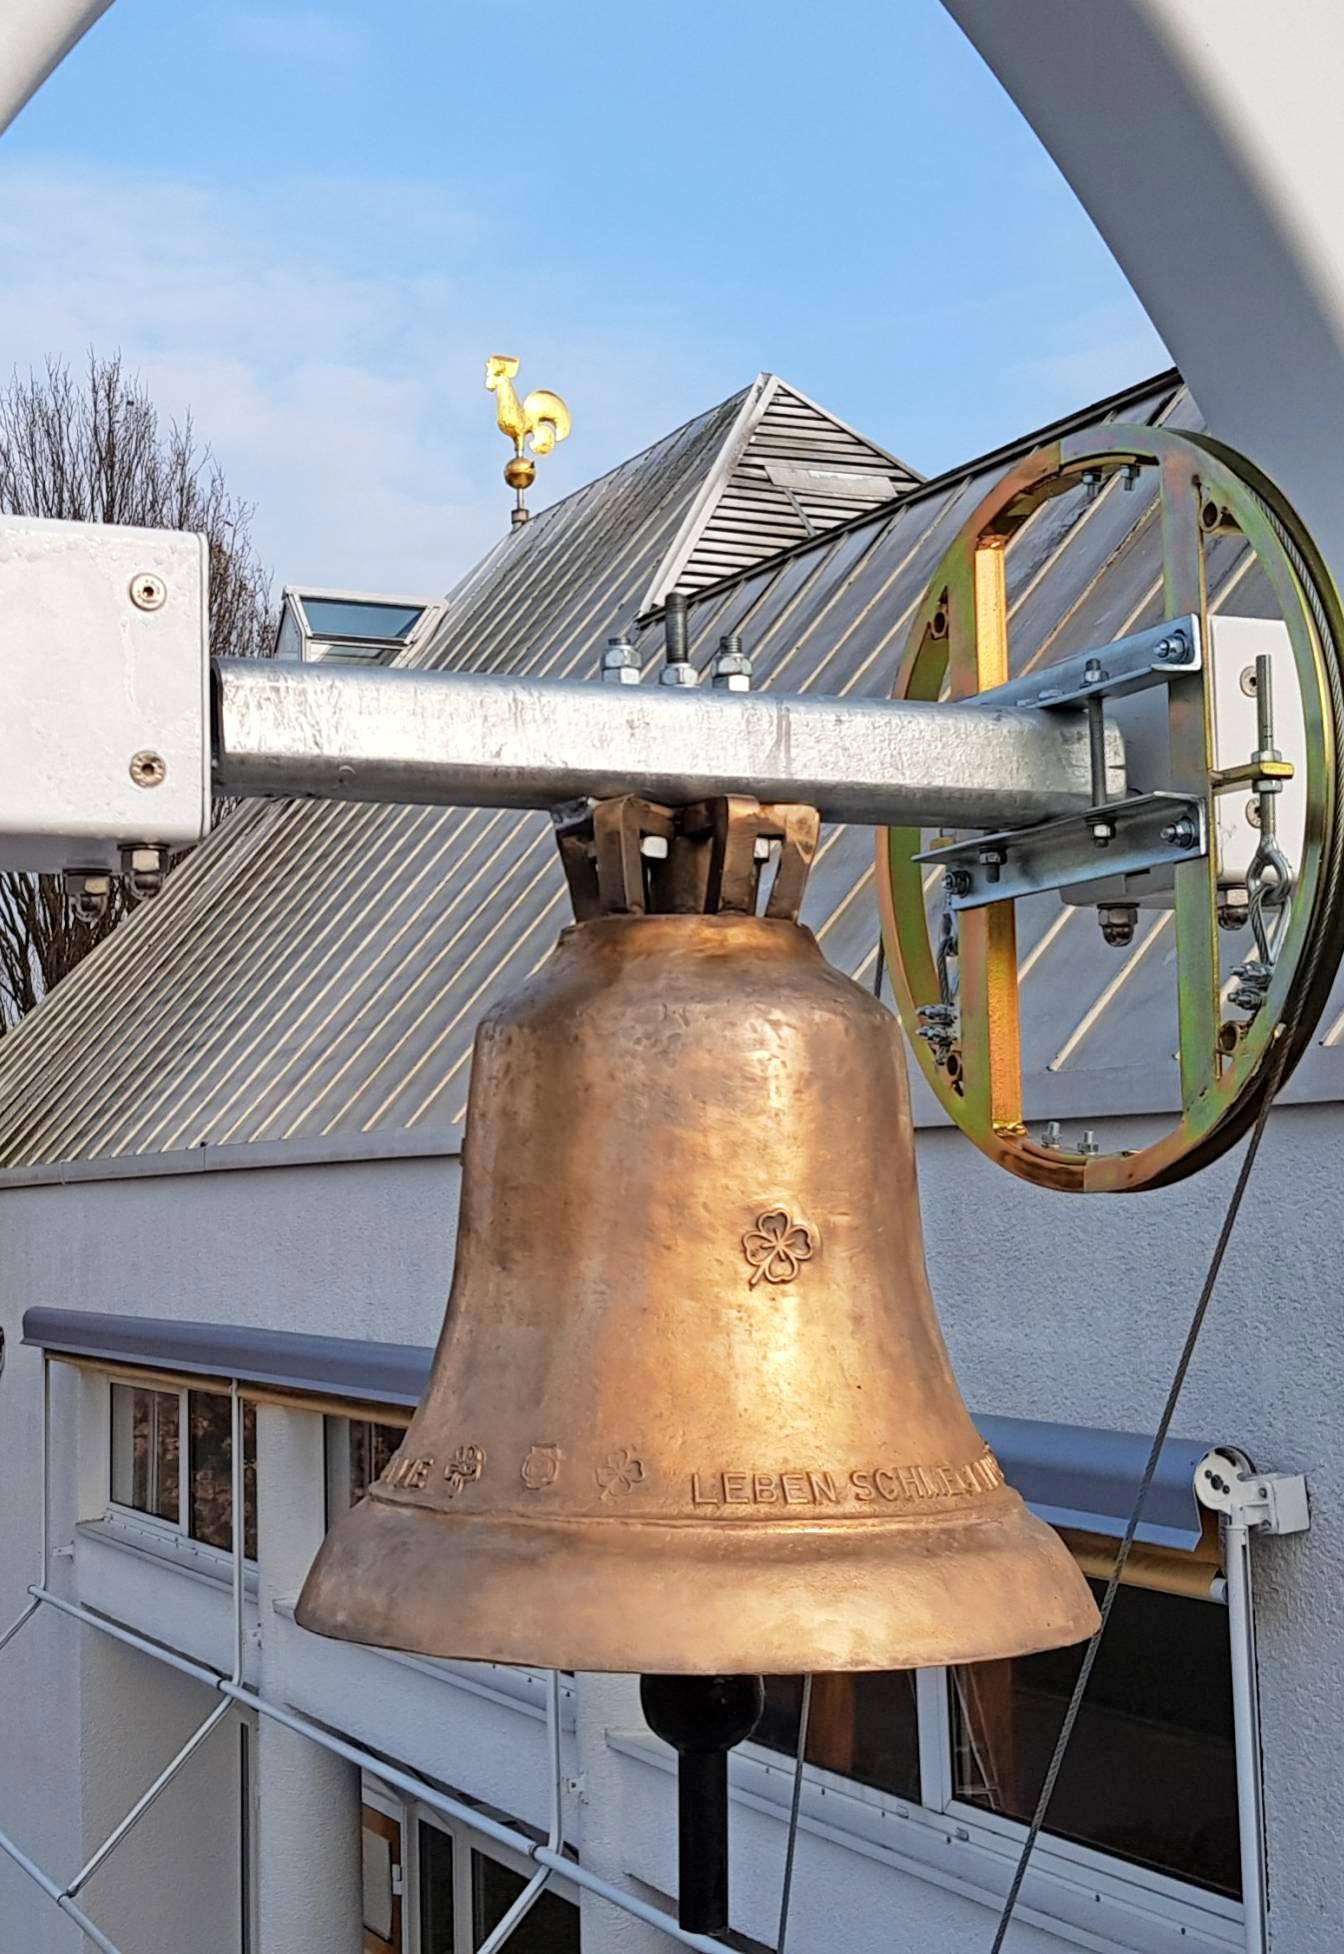 Buga-Glocke läutet jetzt auf dem Neuberg Image 1